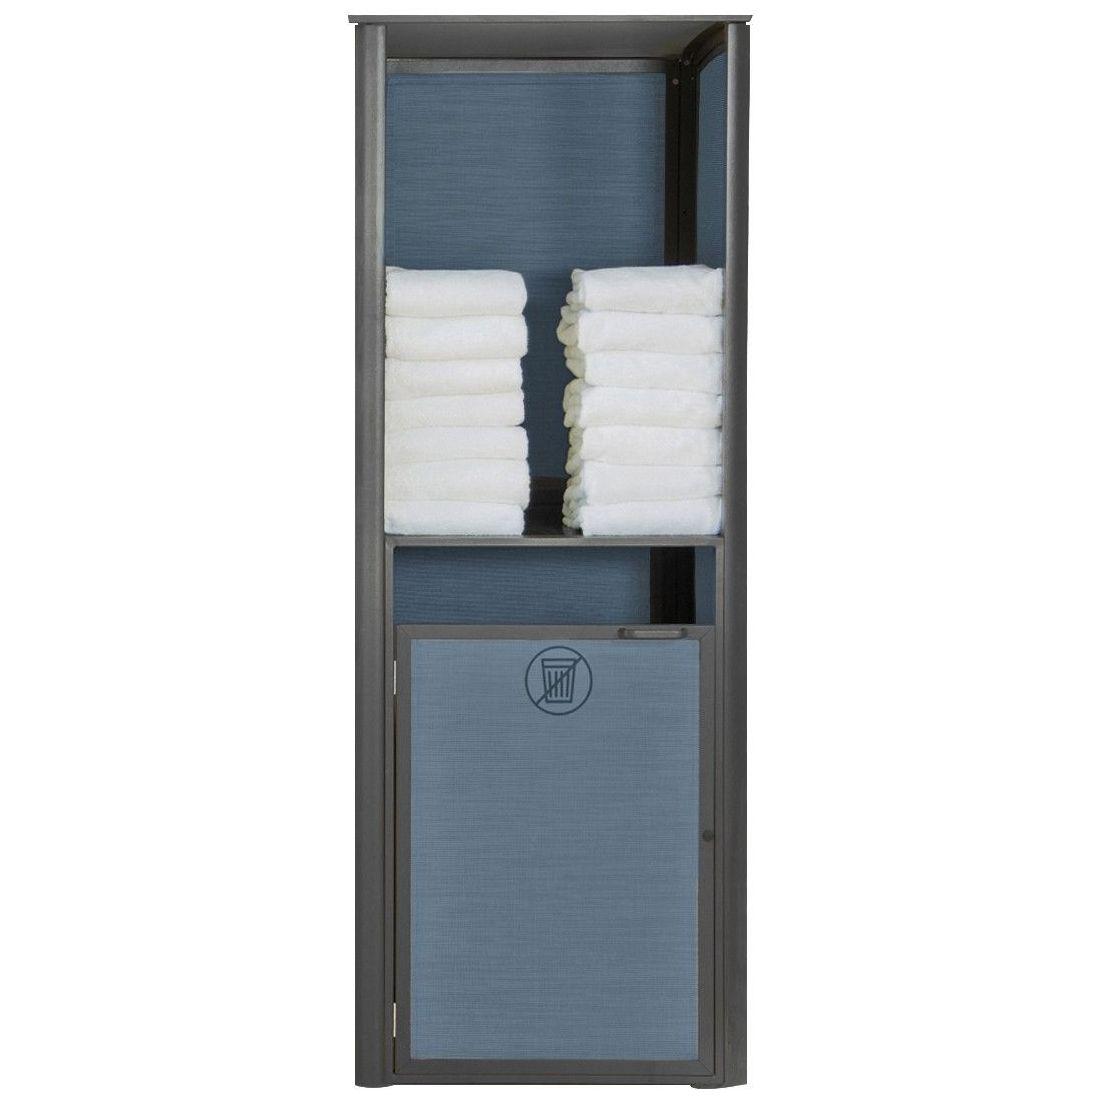 Grosfillex Sunset Towel Valet Single Unit in Solid Gray/Volcanic Black